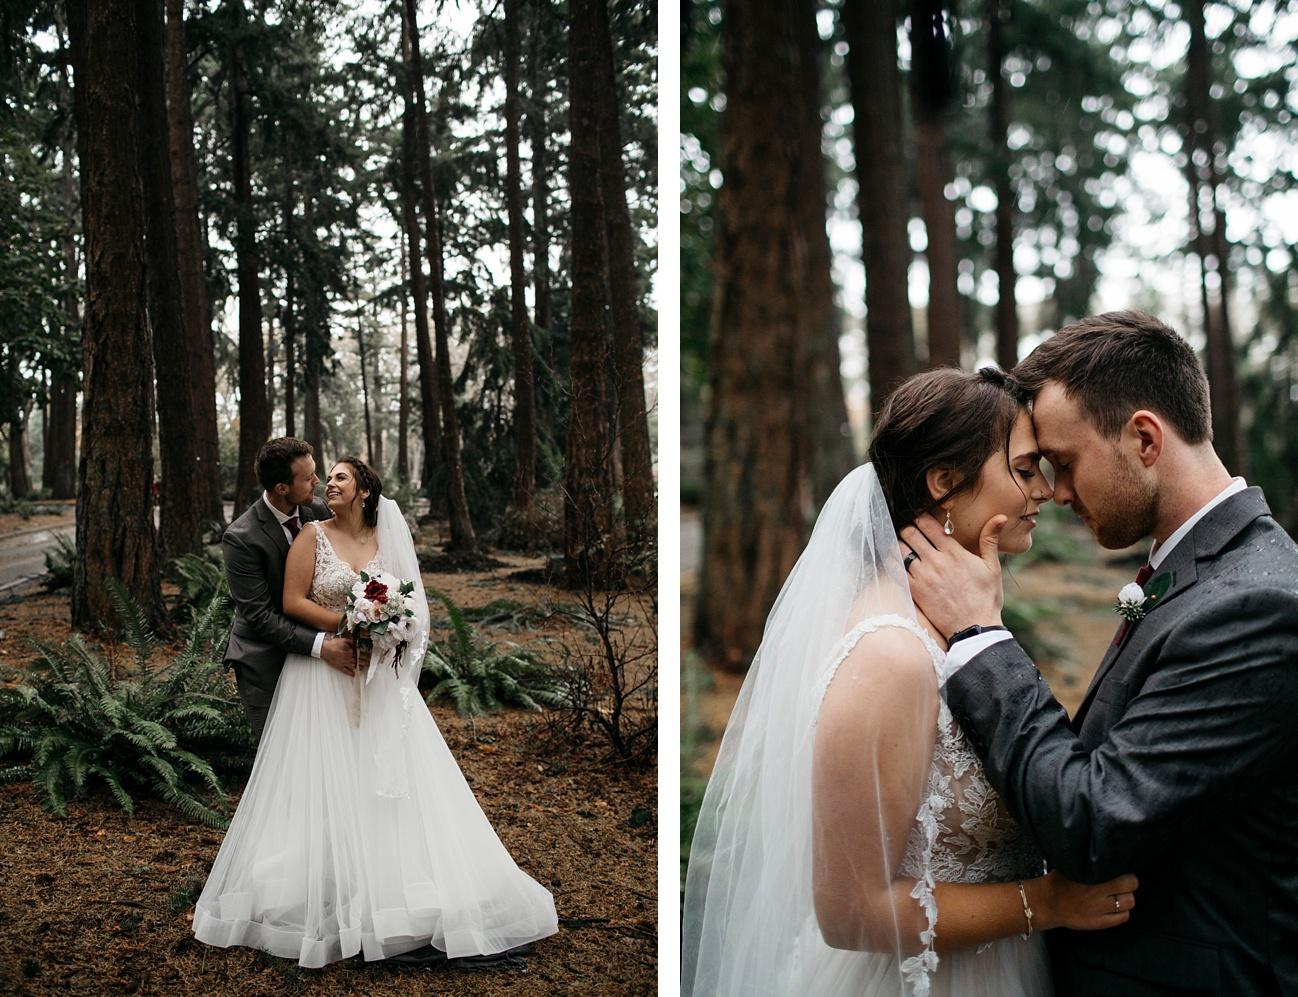 Beacon Hill Wedding | Rachael Alexandra Co | Victoria BC Photographer | Vancouver Island Lifestyle and Wedding Photographer_0137.jpg